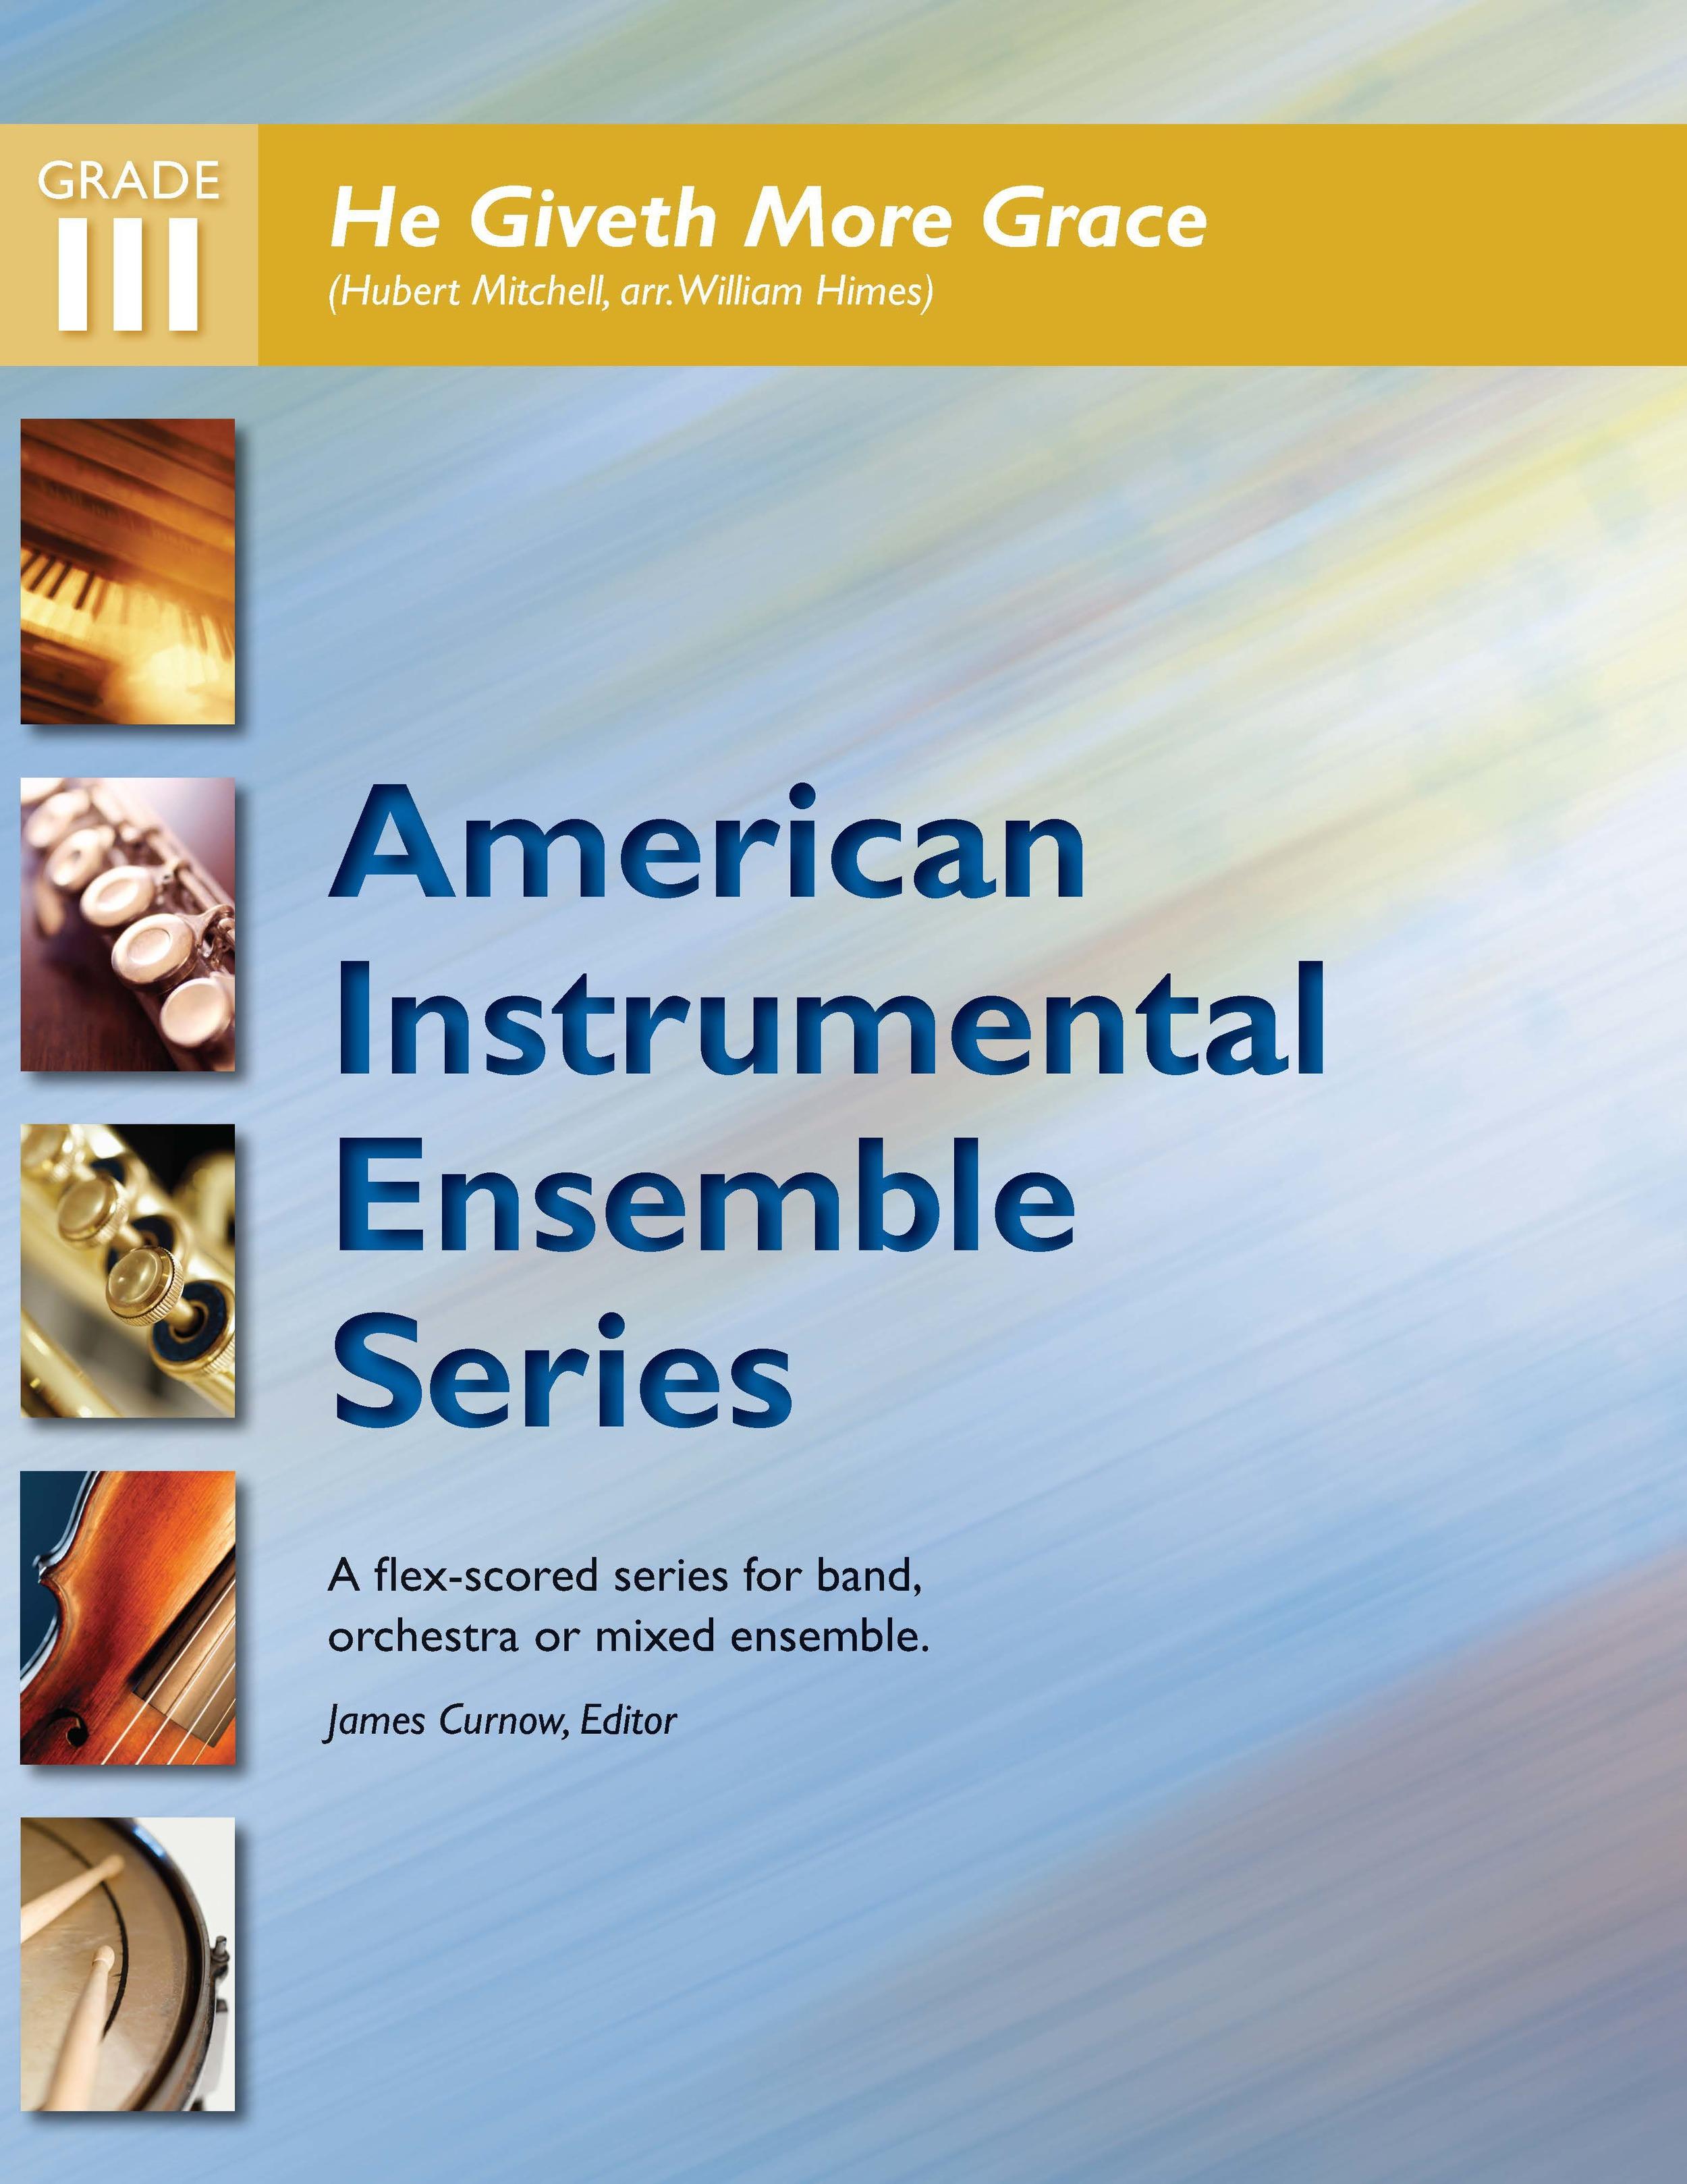 American Instrumental Ensemble Series